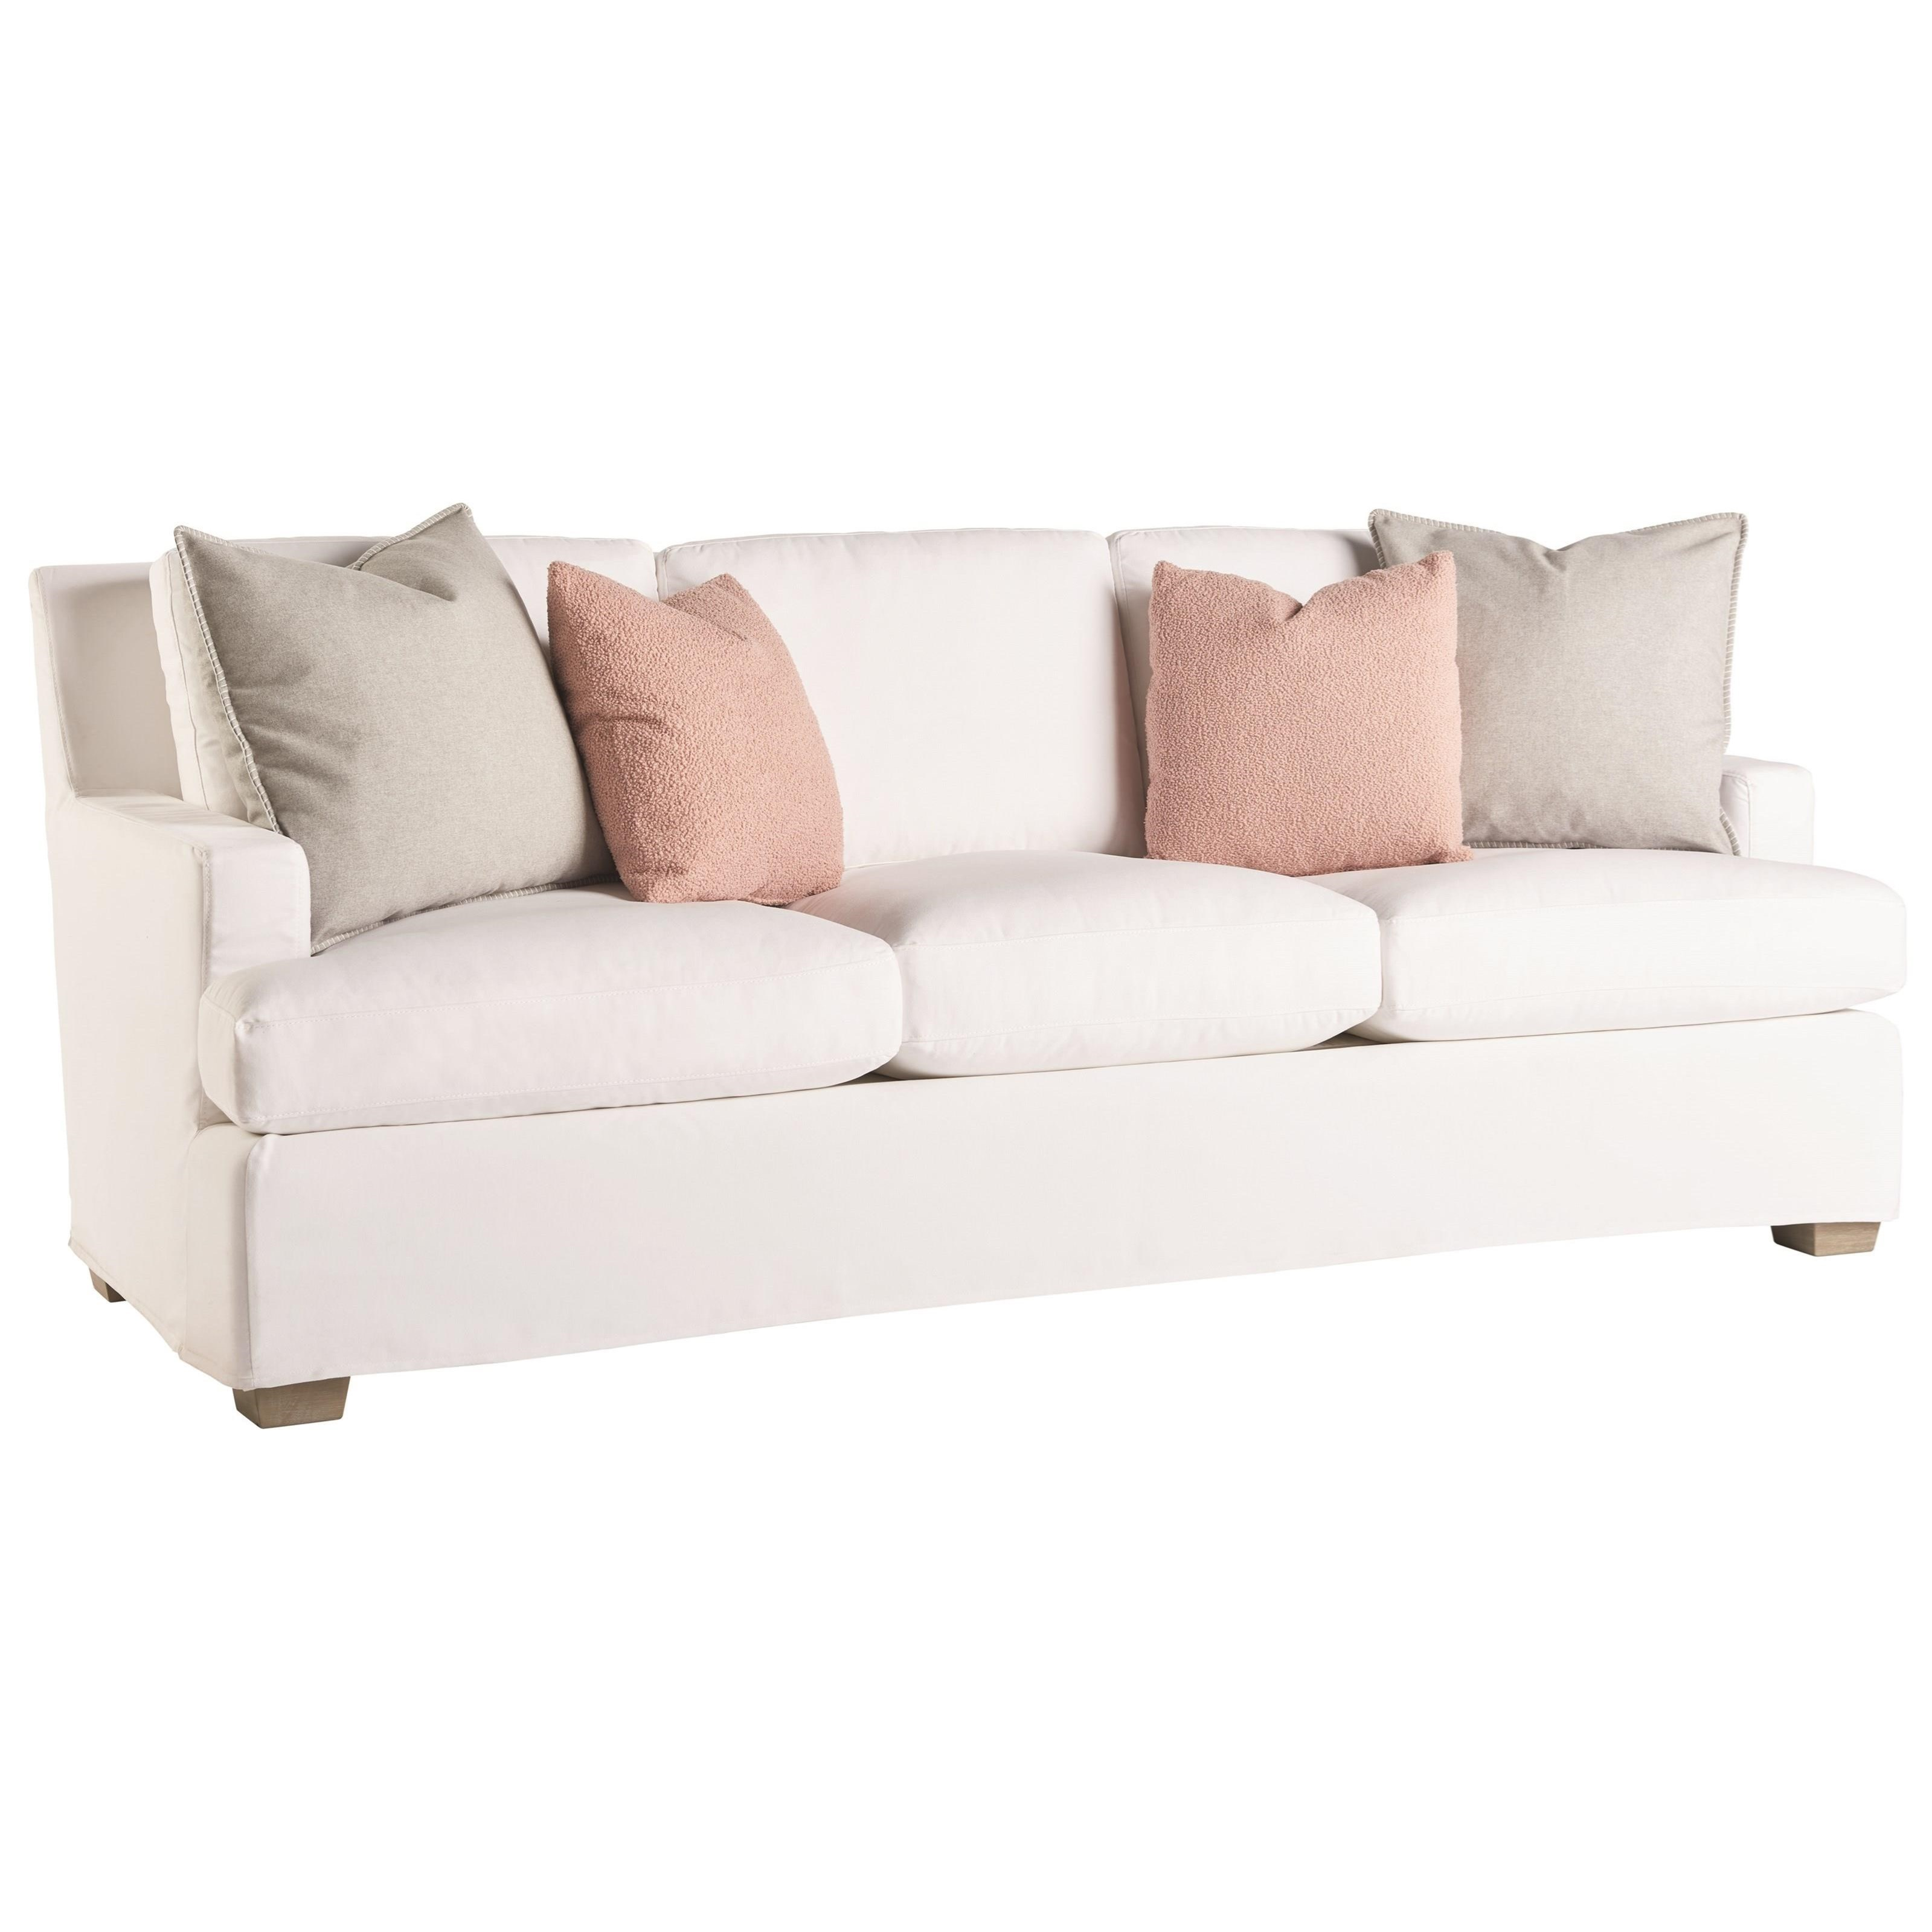 Love. Joy. Bliss.-Miranda Kerr Home Malibu Slipcover Sofa by Universal at Suburban Furniture